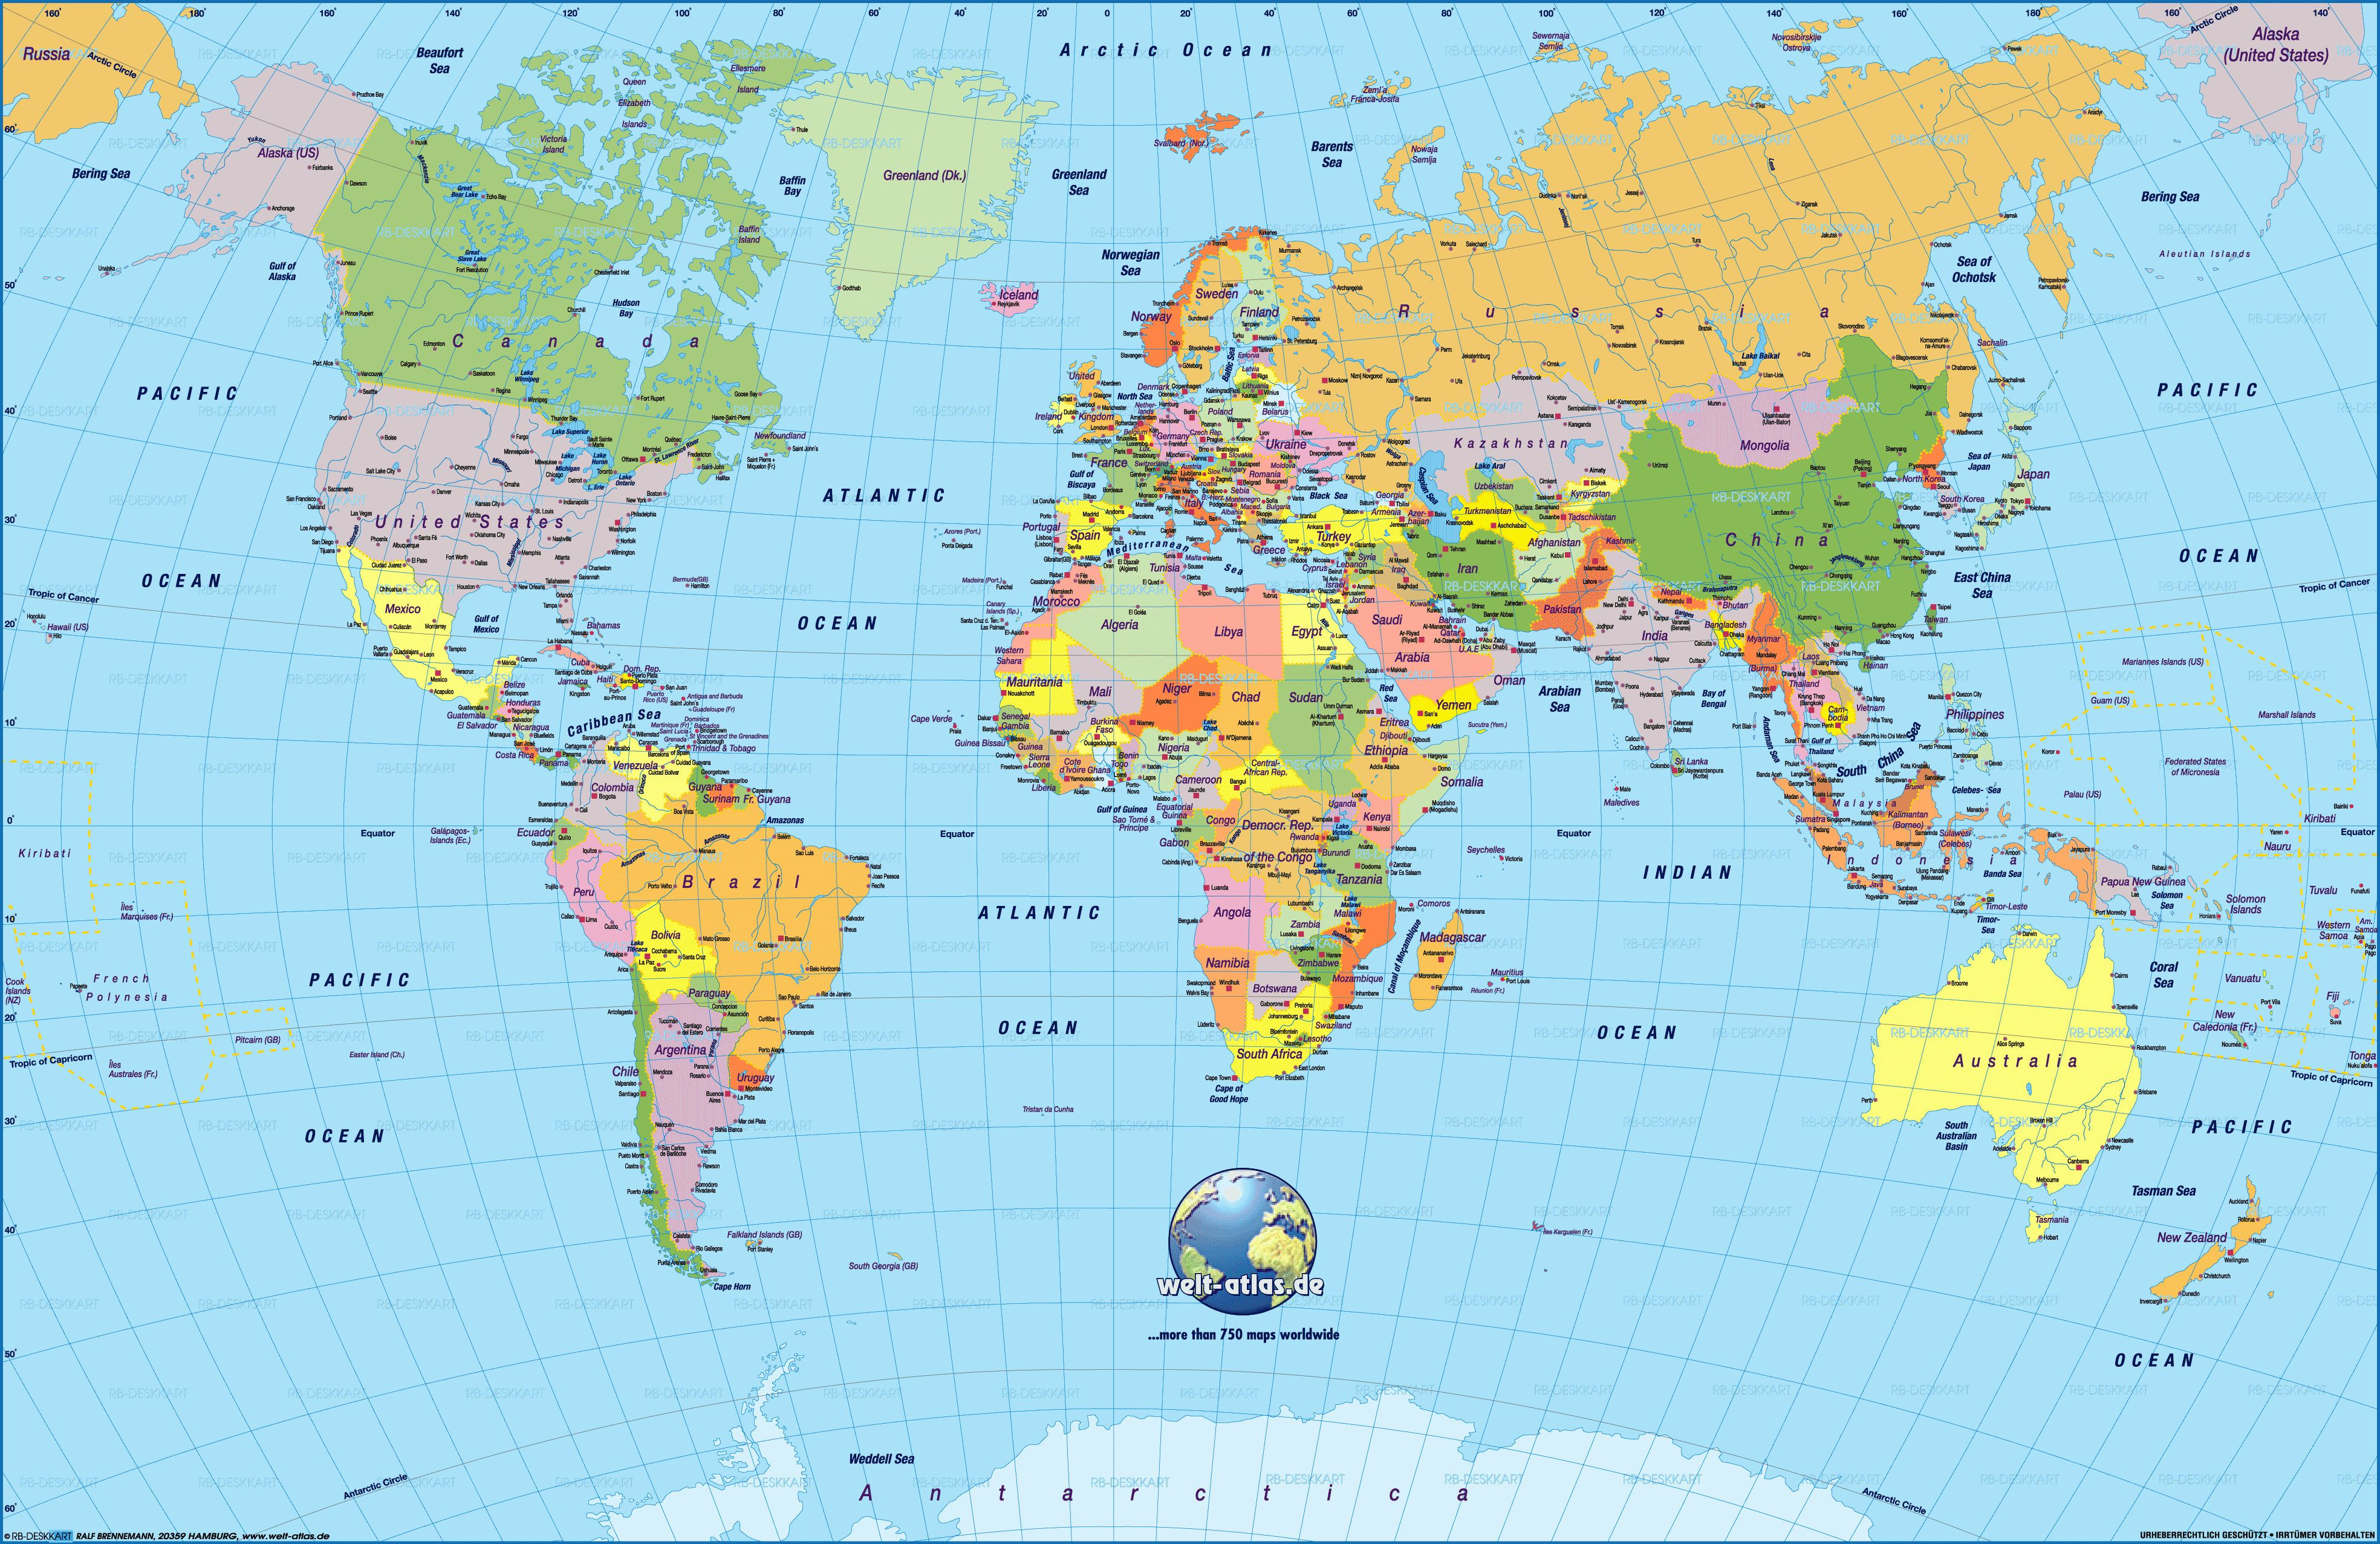 Cool World Map Pdf 2 | Maps | Detailed World Map, World Map - Free Printable World Map Pdf